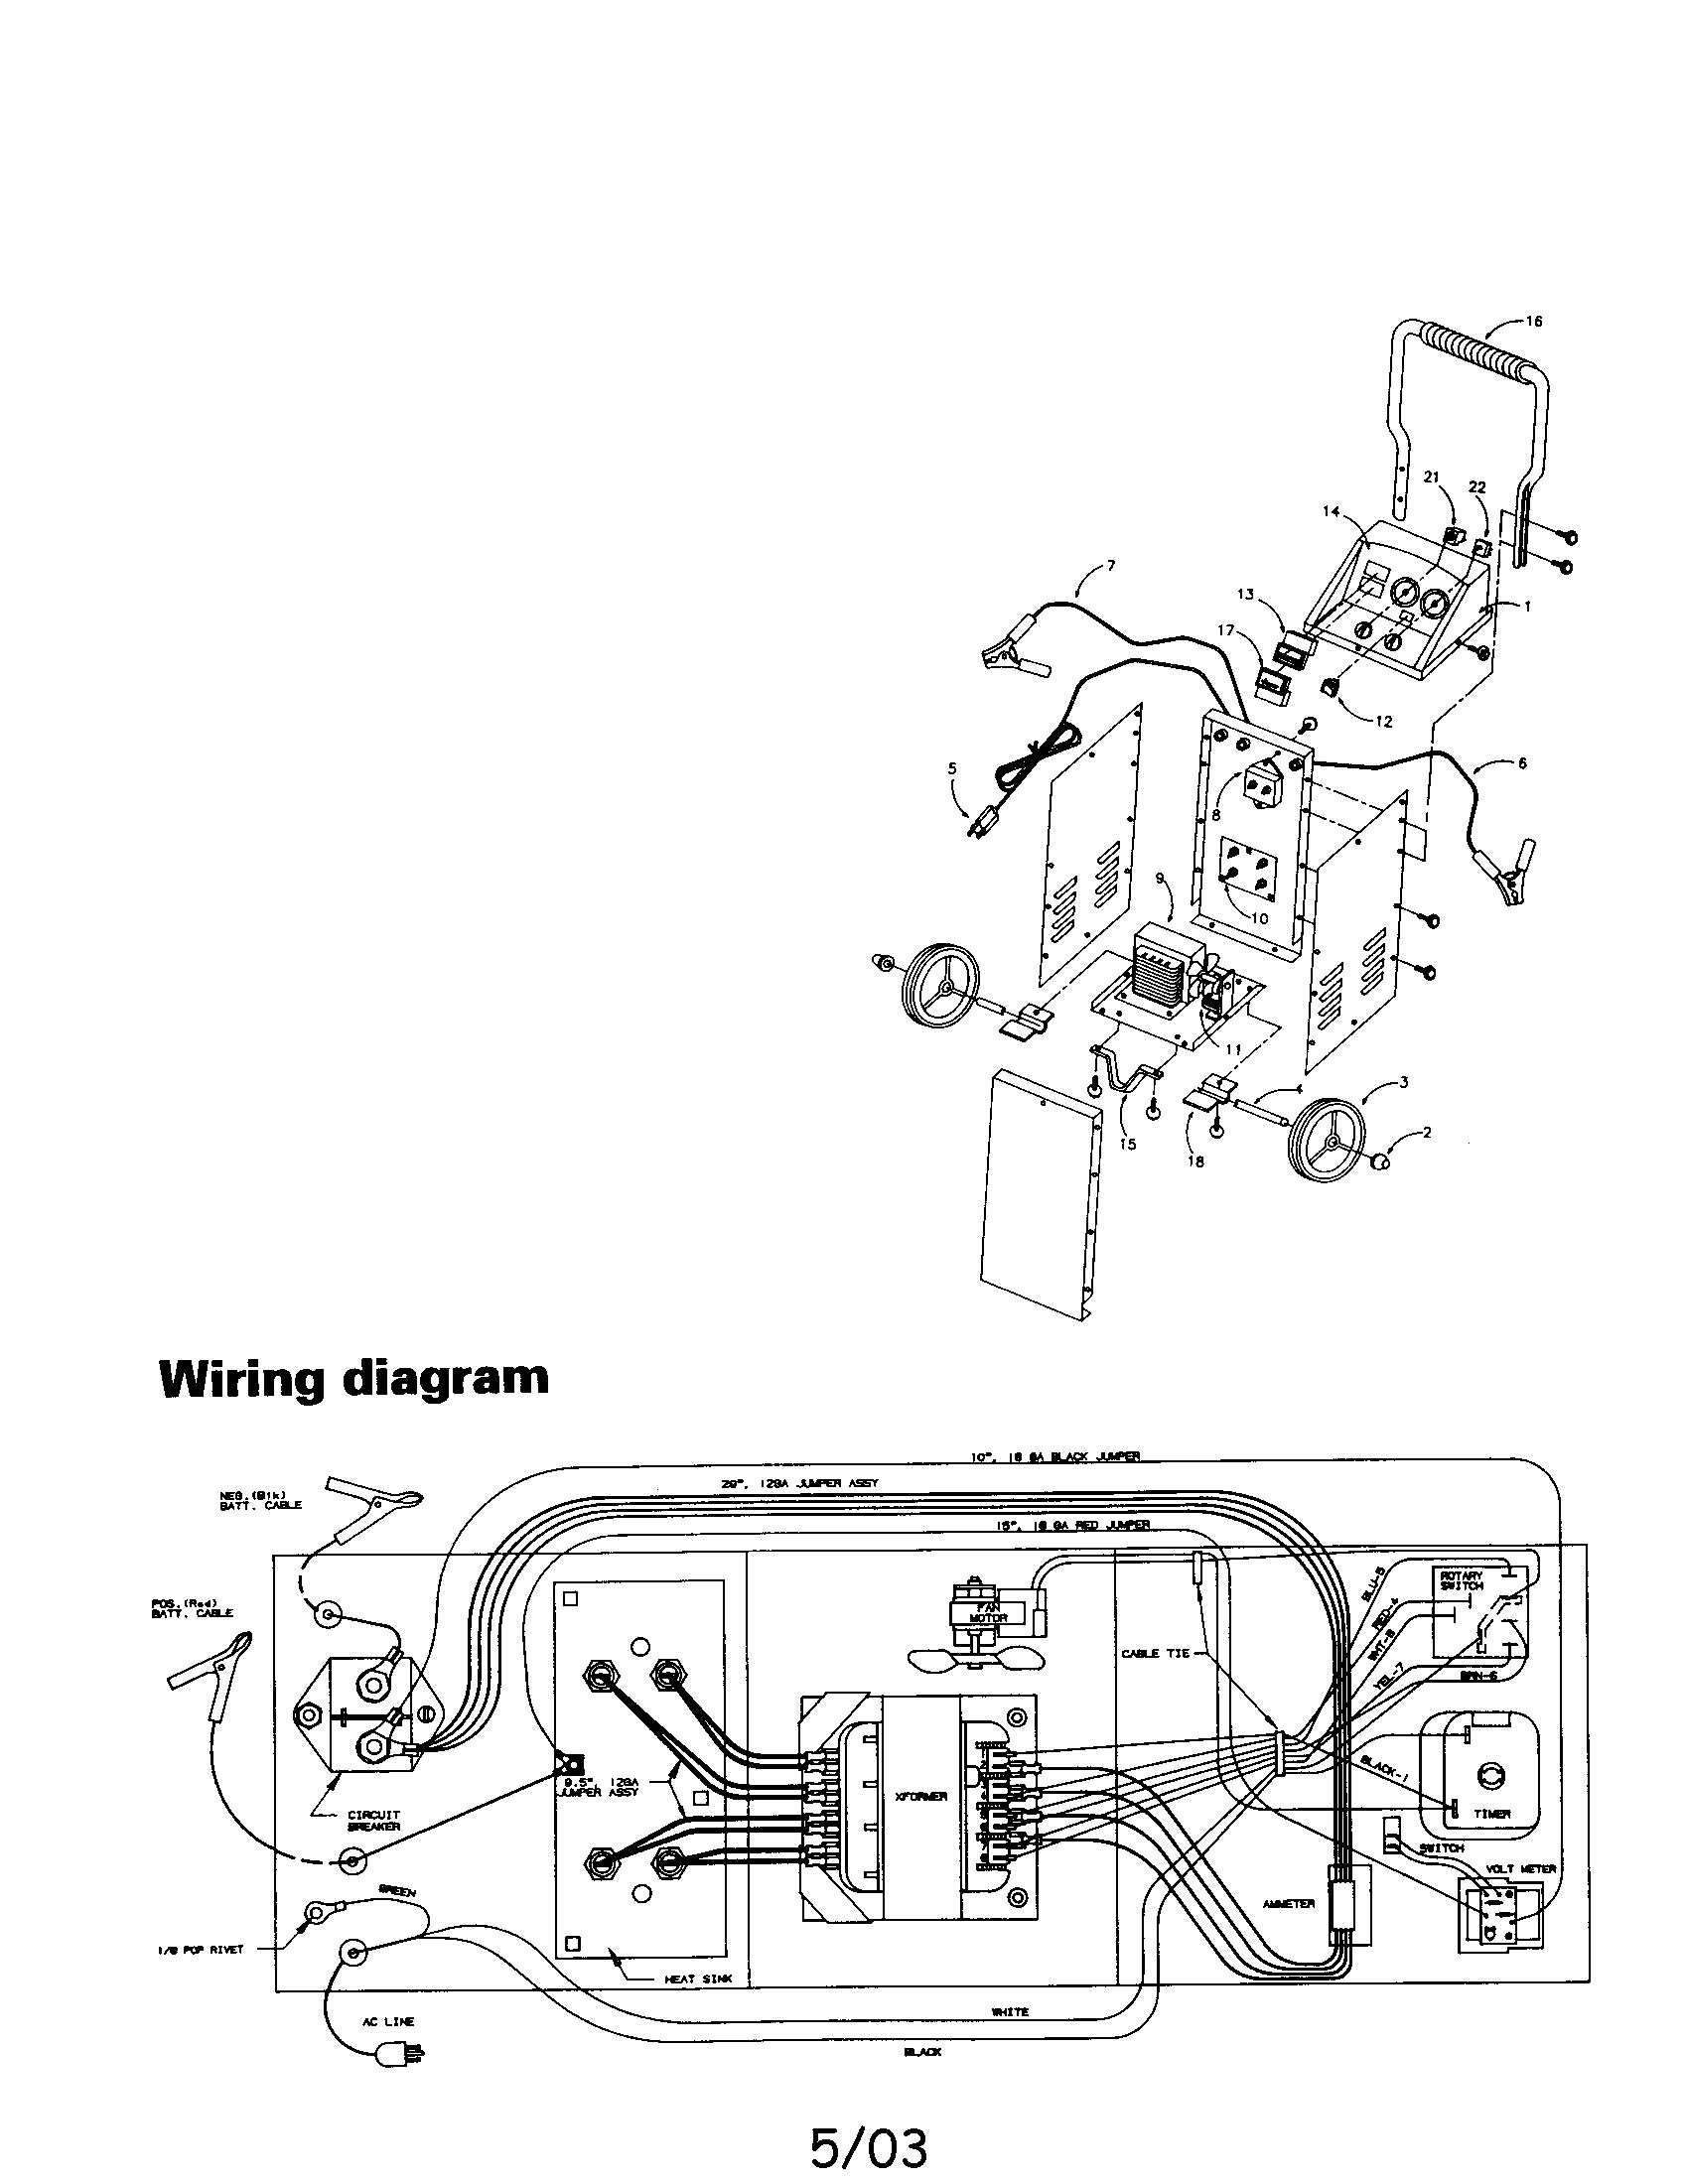 CK_8521] Hobart Battery Charger Wiring Diagram Schematic WiringRele Gresi Apom Waro Isop Benkeme Mohammedshrine Librar Wiring 101